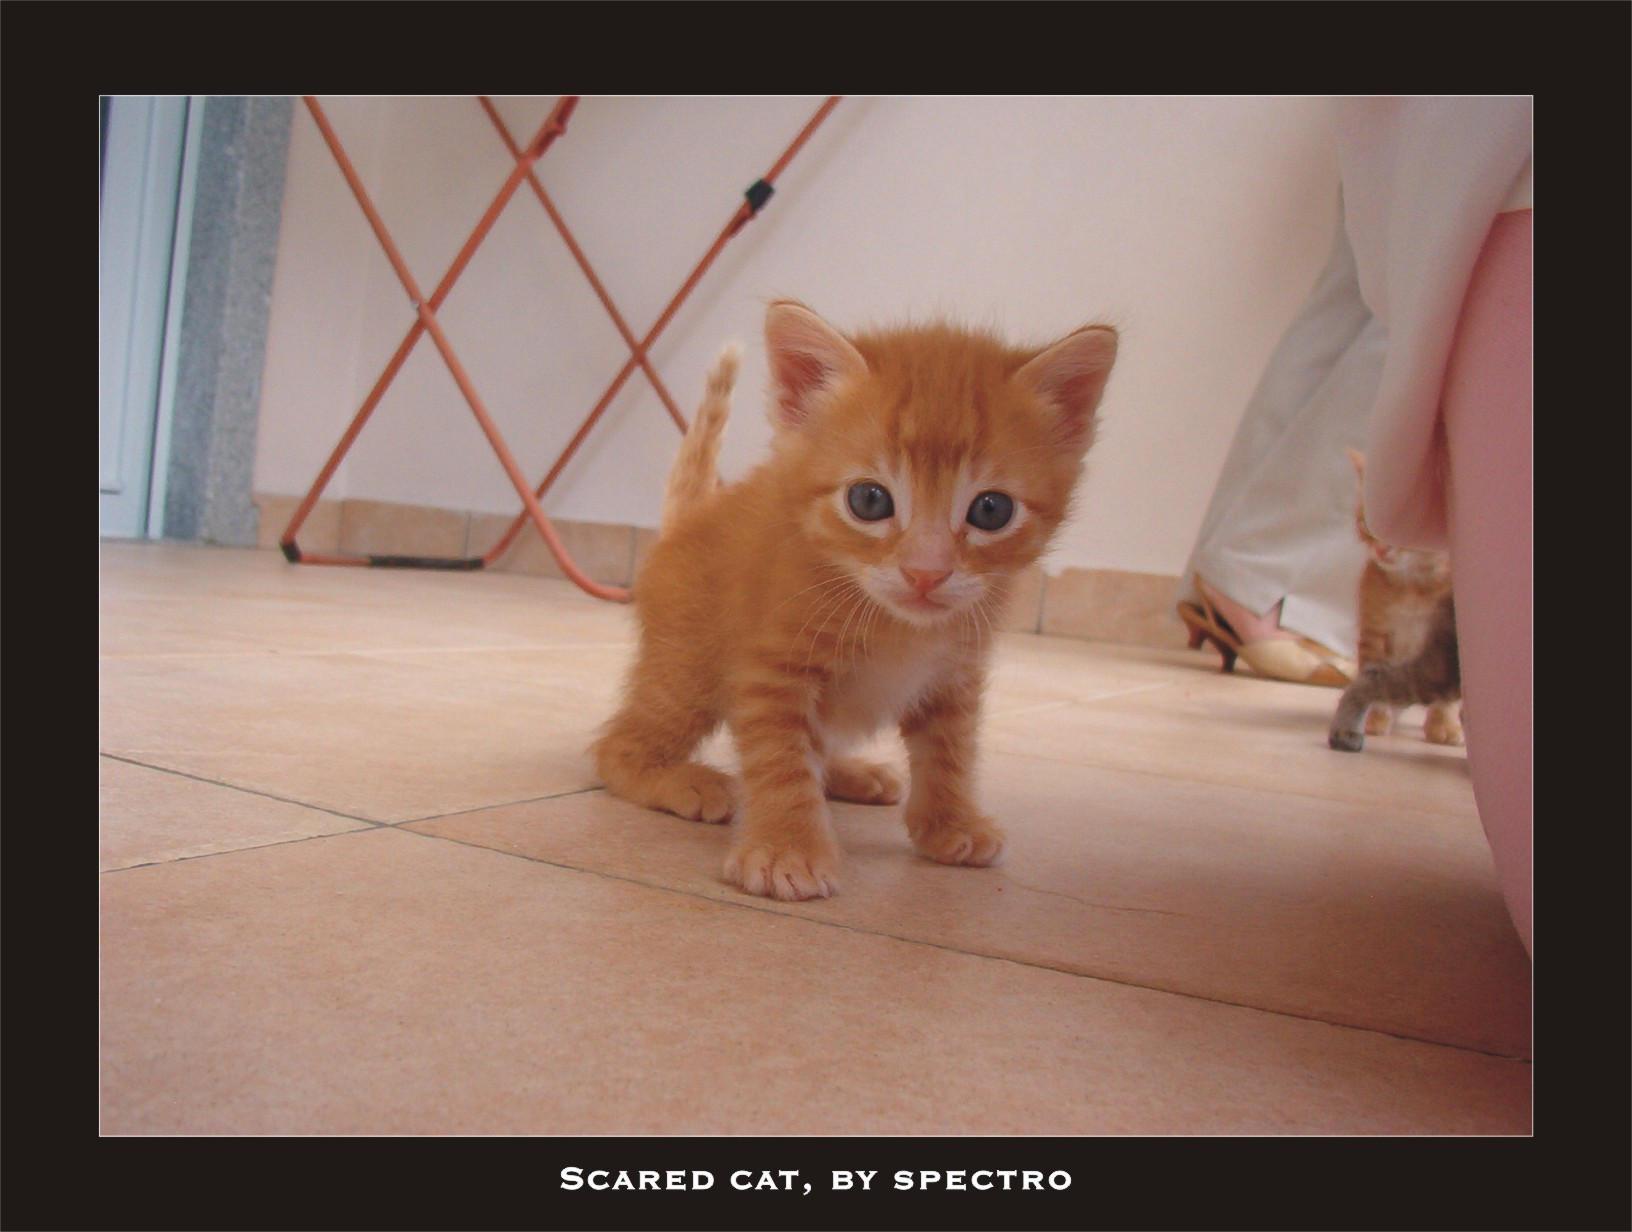 world of warcraft crazy cat lady